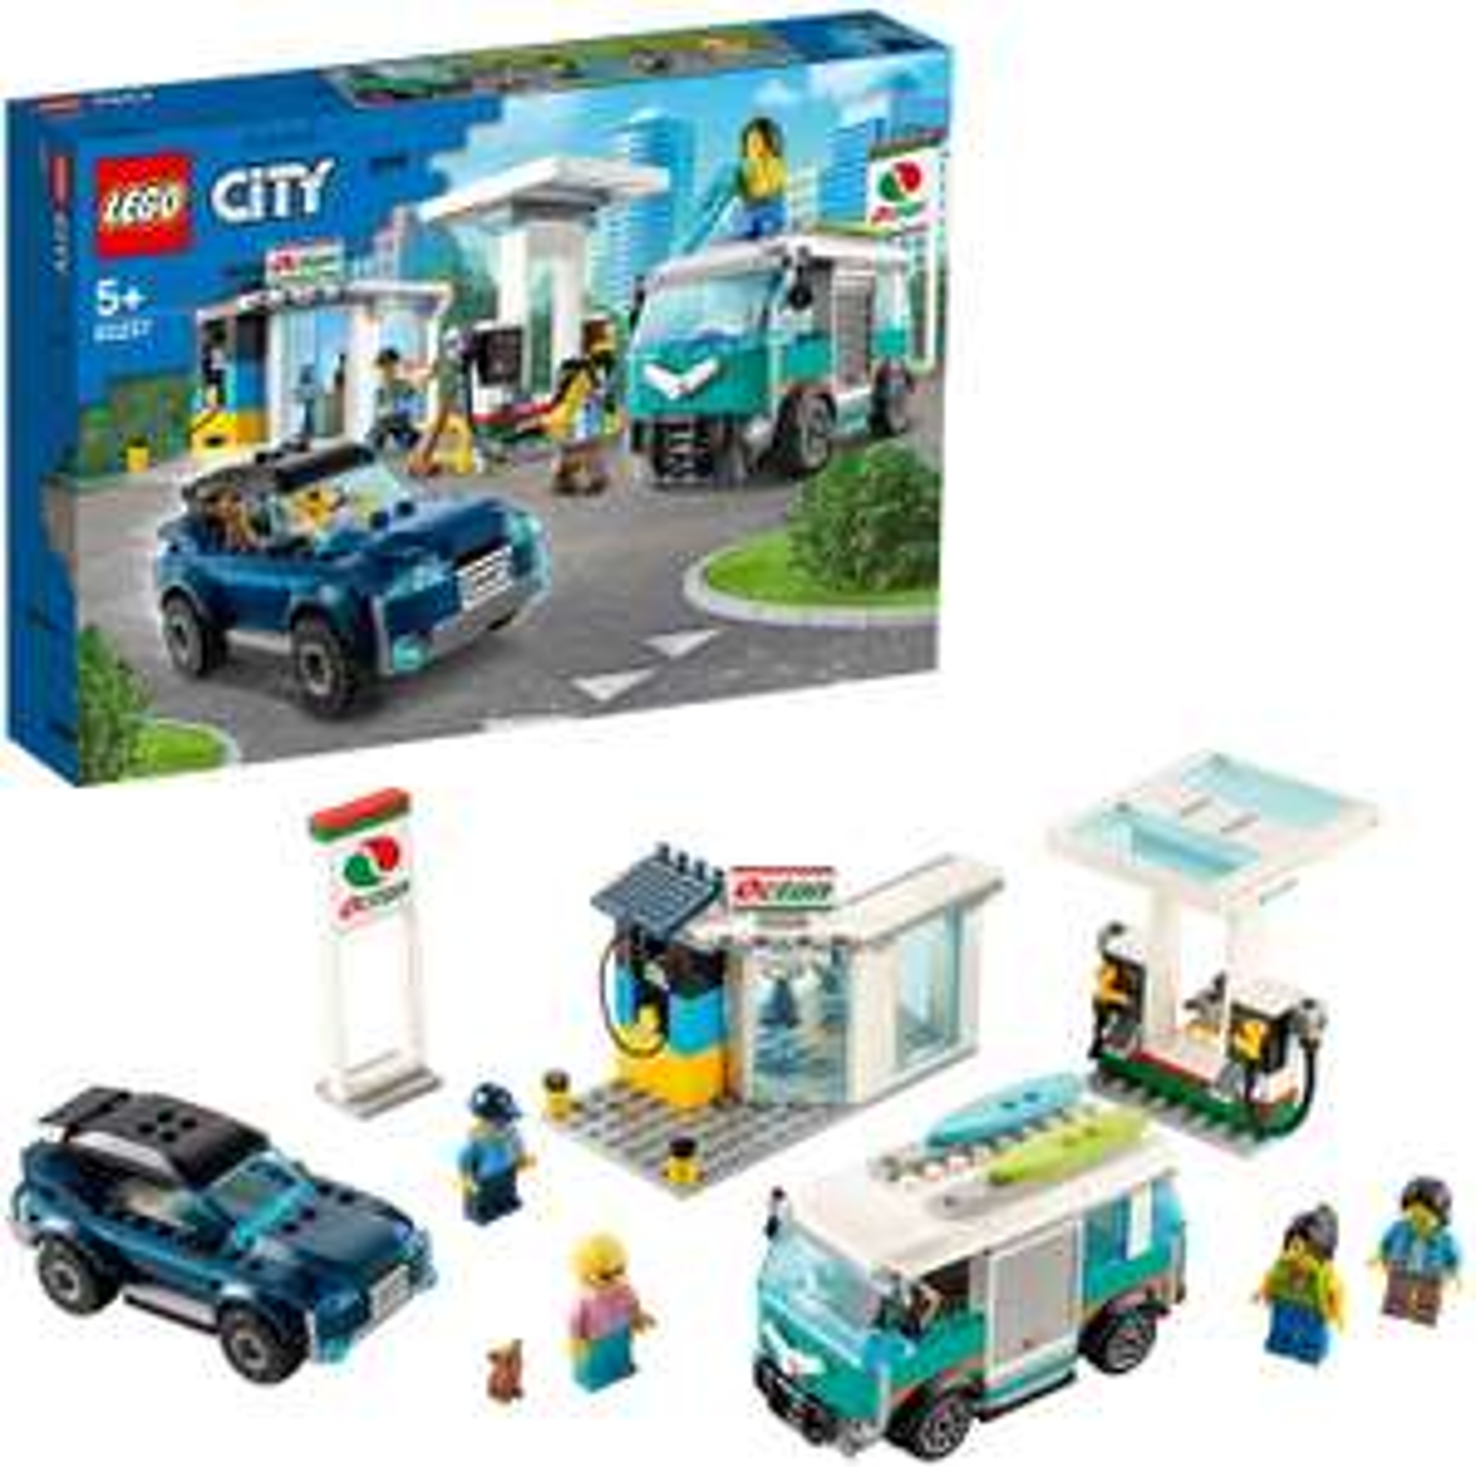 LEGO 60257 City Nitro Wheels Service Station £31.47 delivered at Amazon